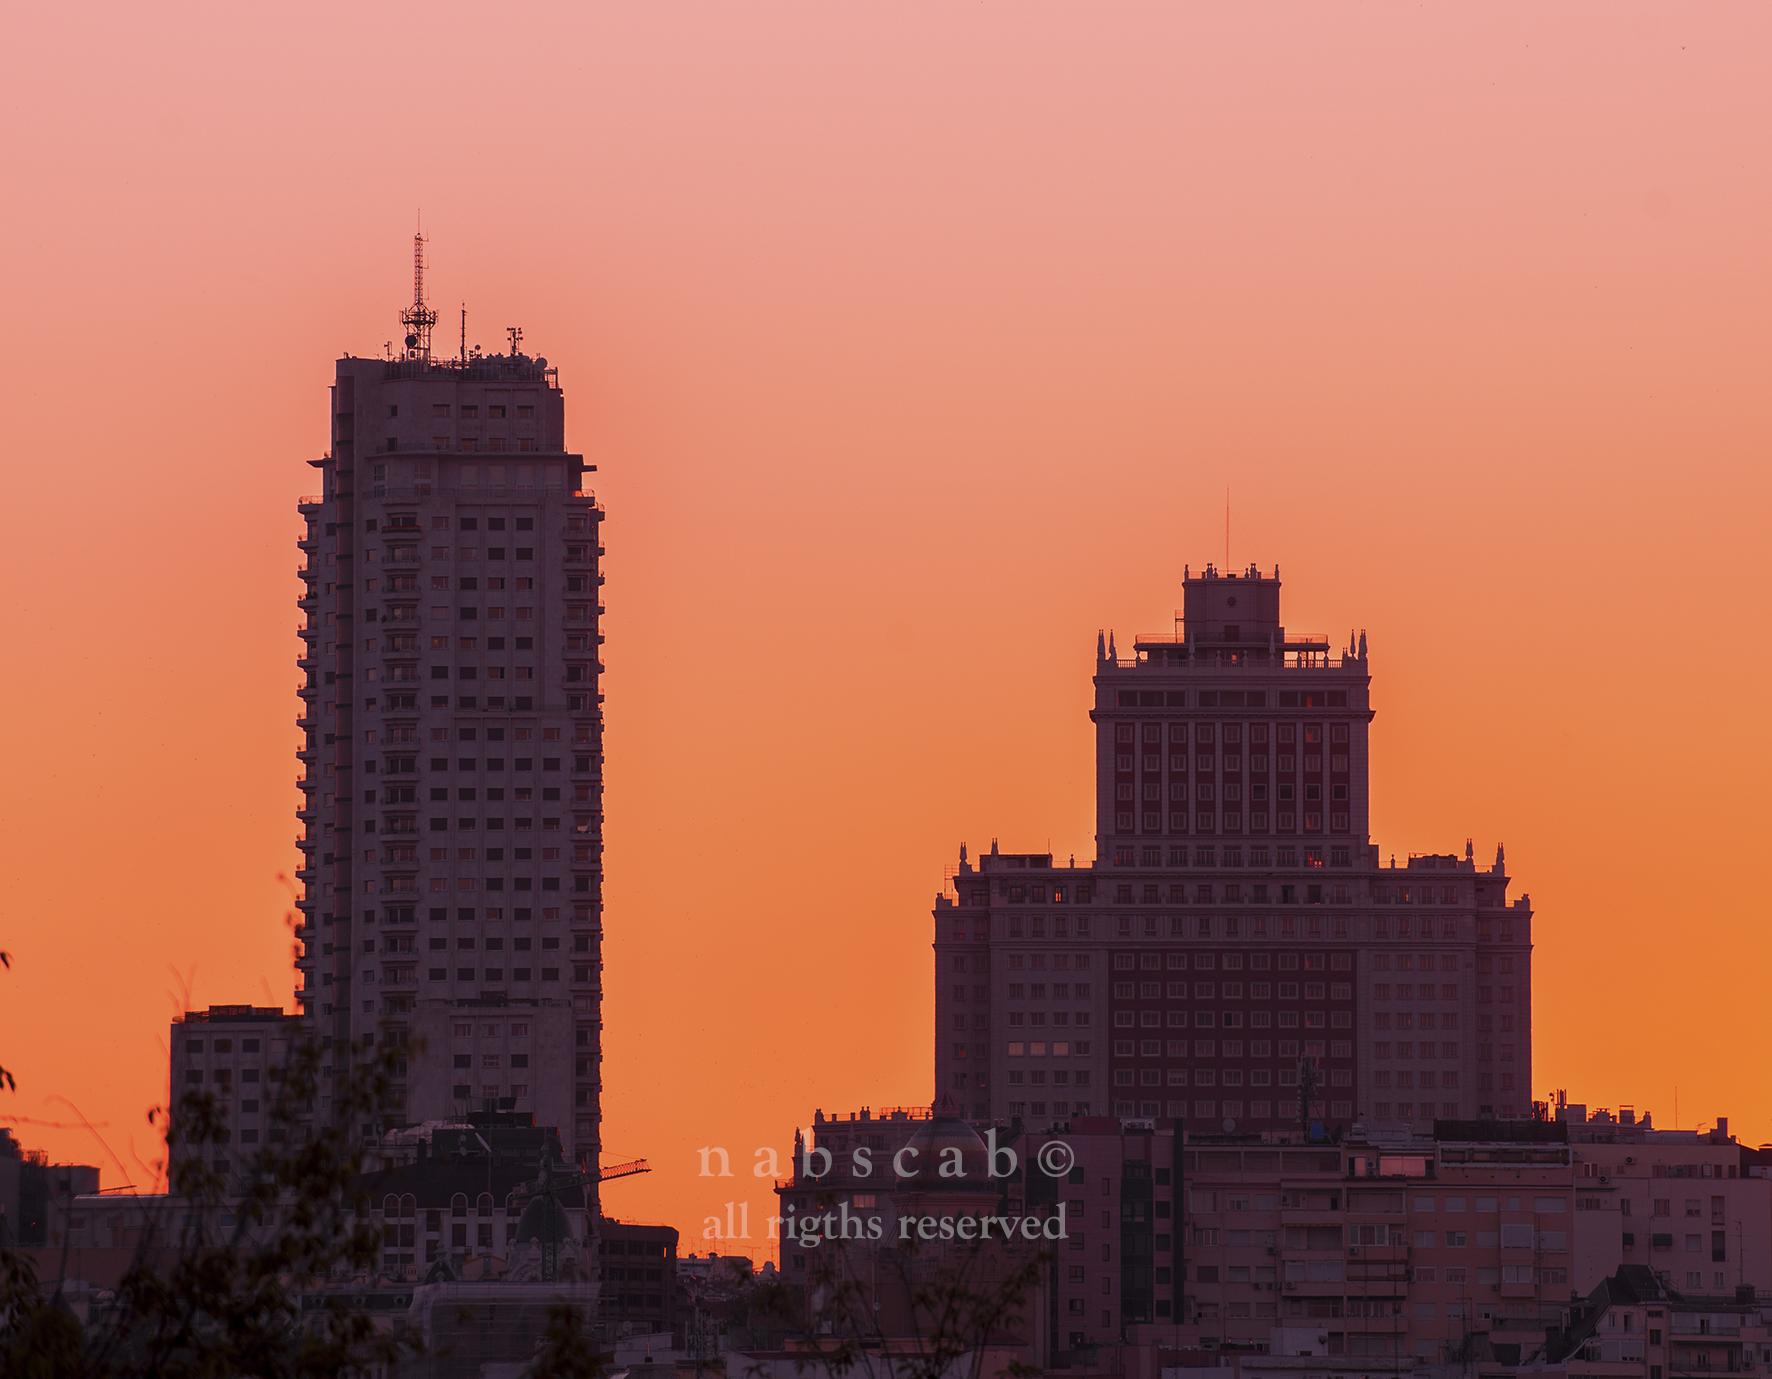 Madrid 6:55h